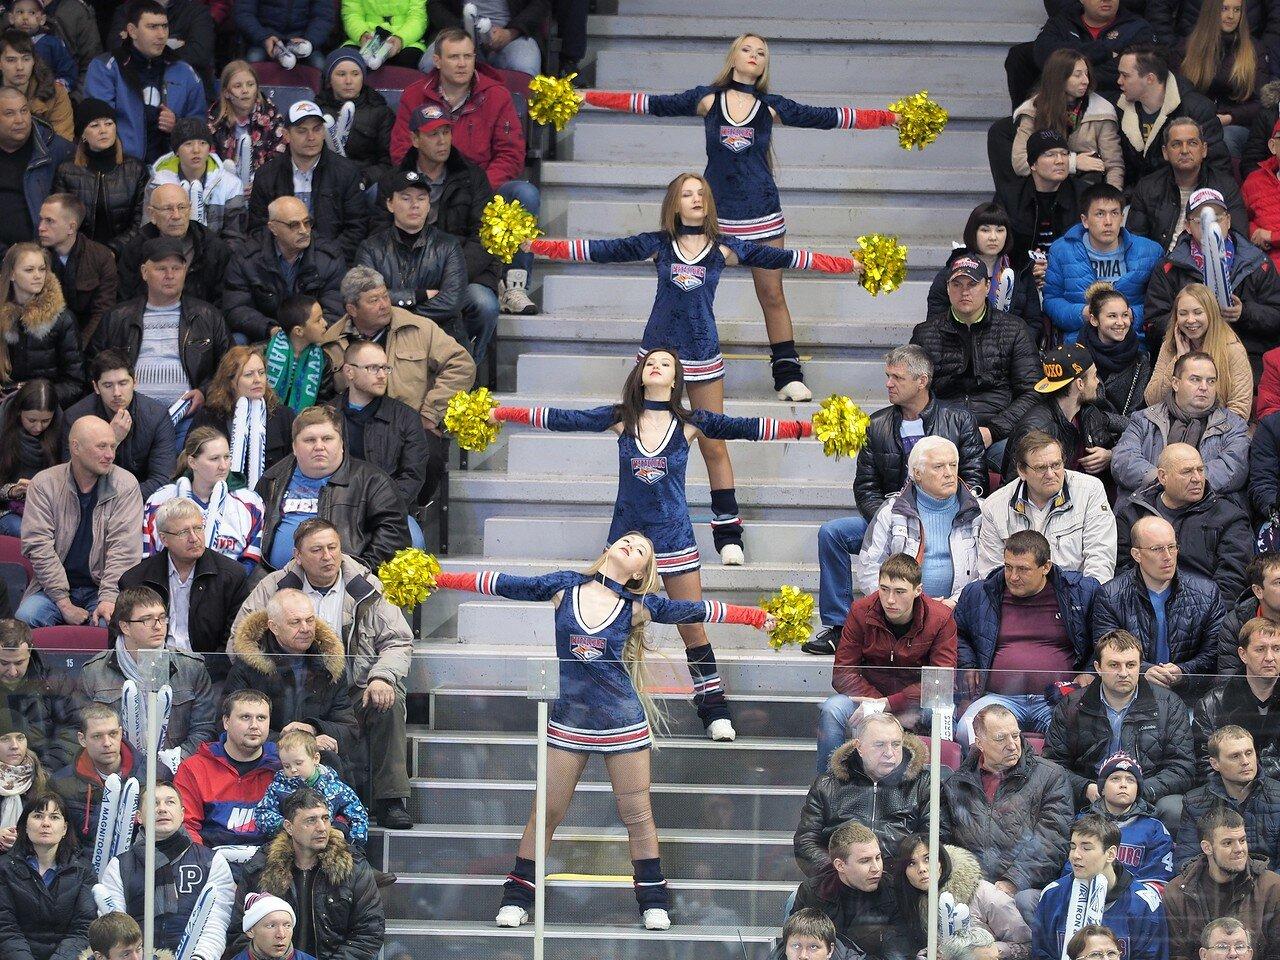 48Плей-офф 2016 Восток Финал Металлург - Салават Юлаев 31.03.2016